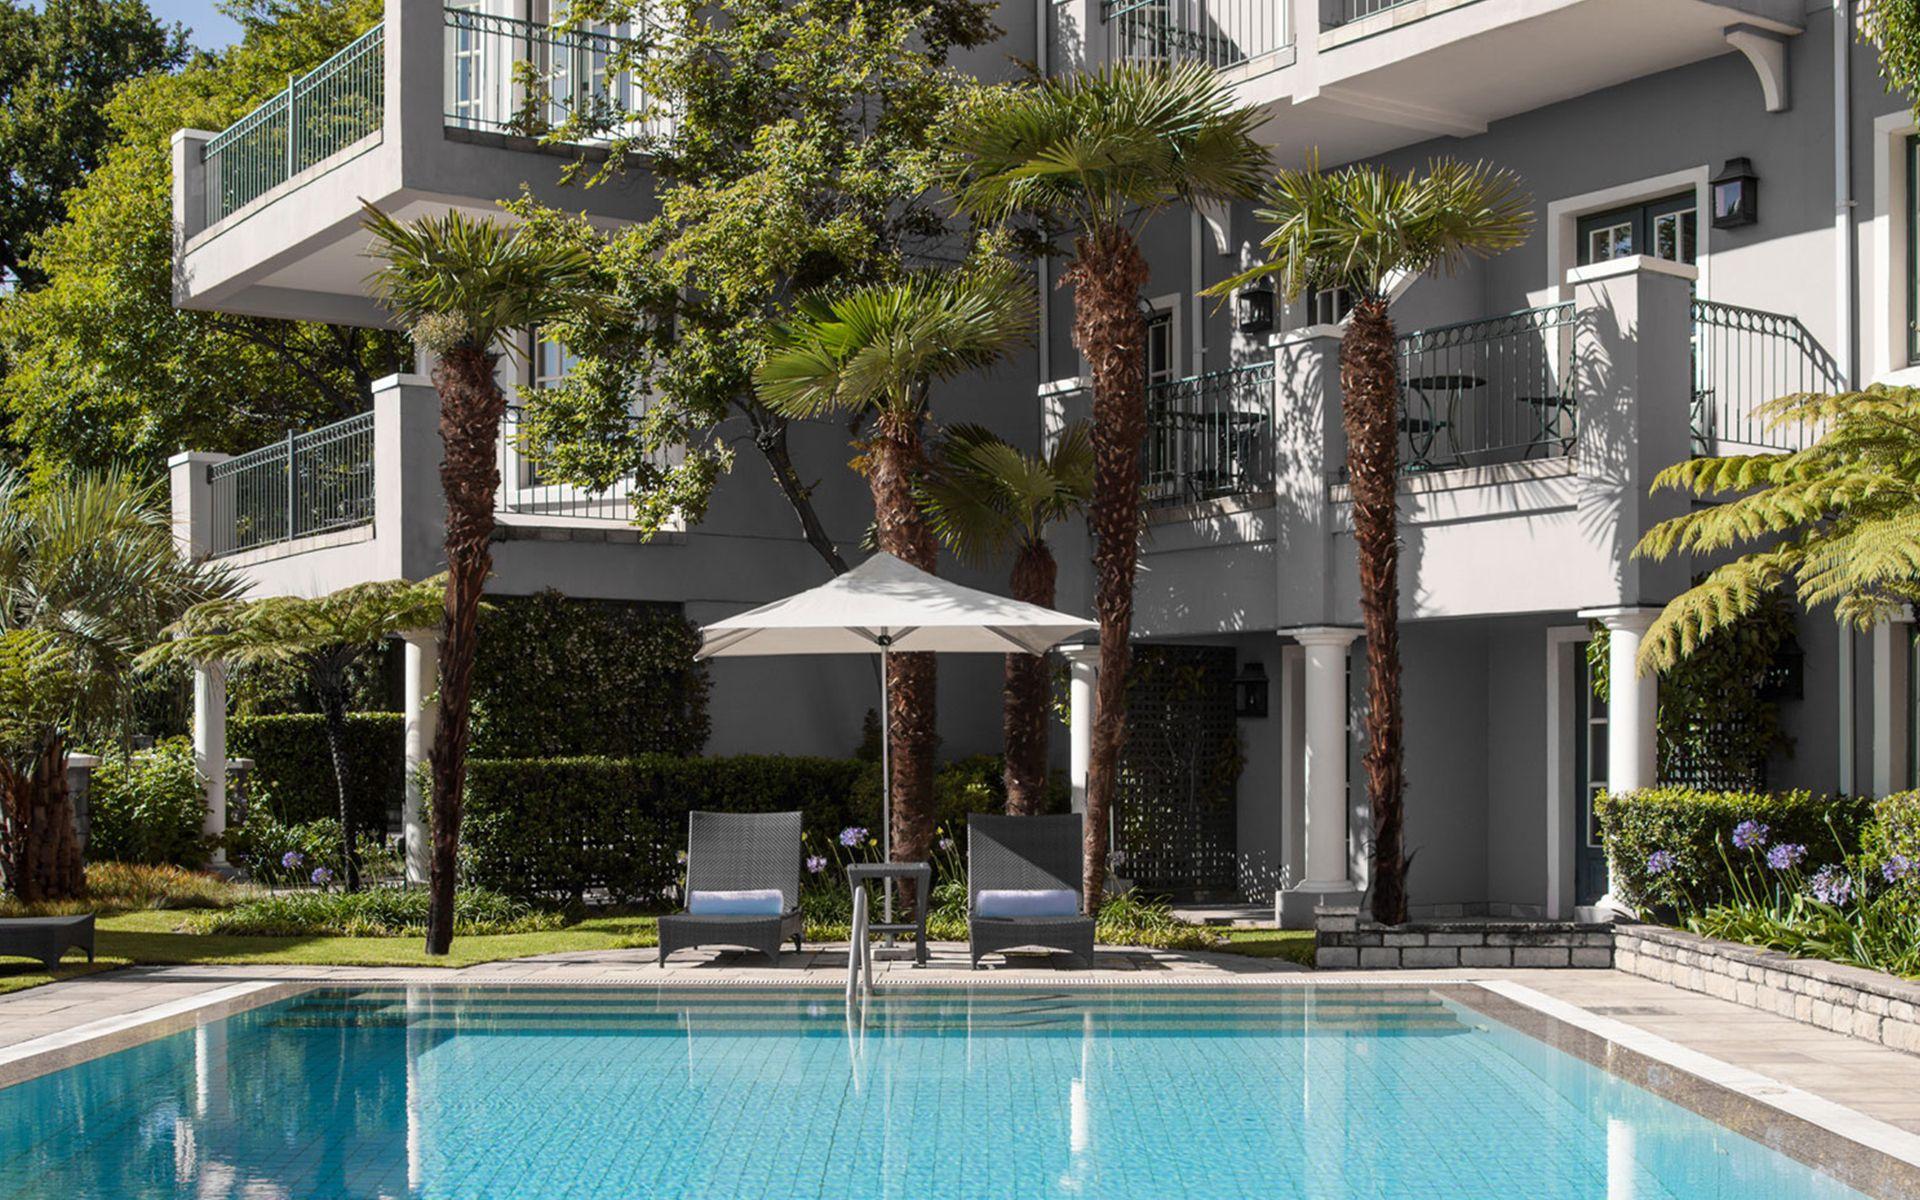 Four Seasons The Westcliff Hotel Johannesburg South Africa Dsa Architects International Urban Hotels Hotel Luxury Hotel